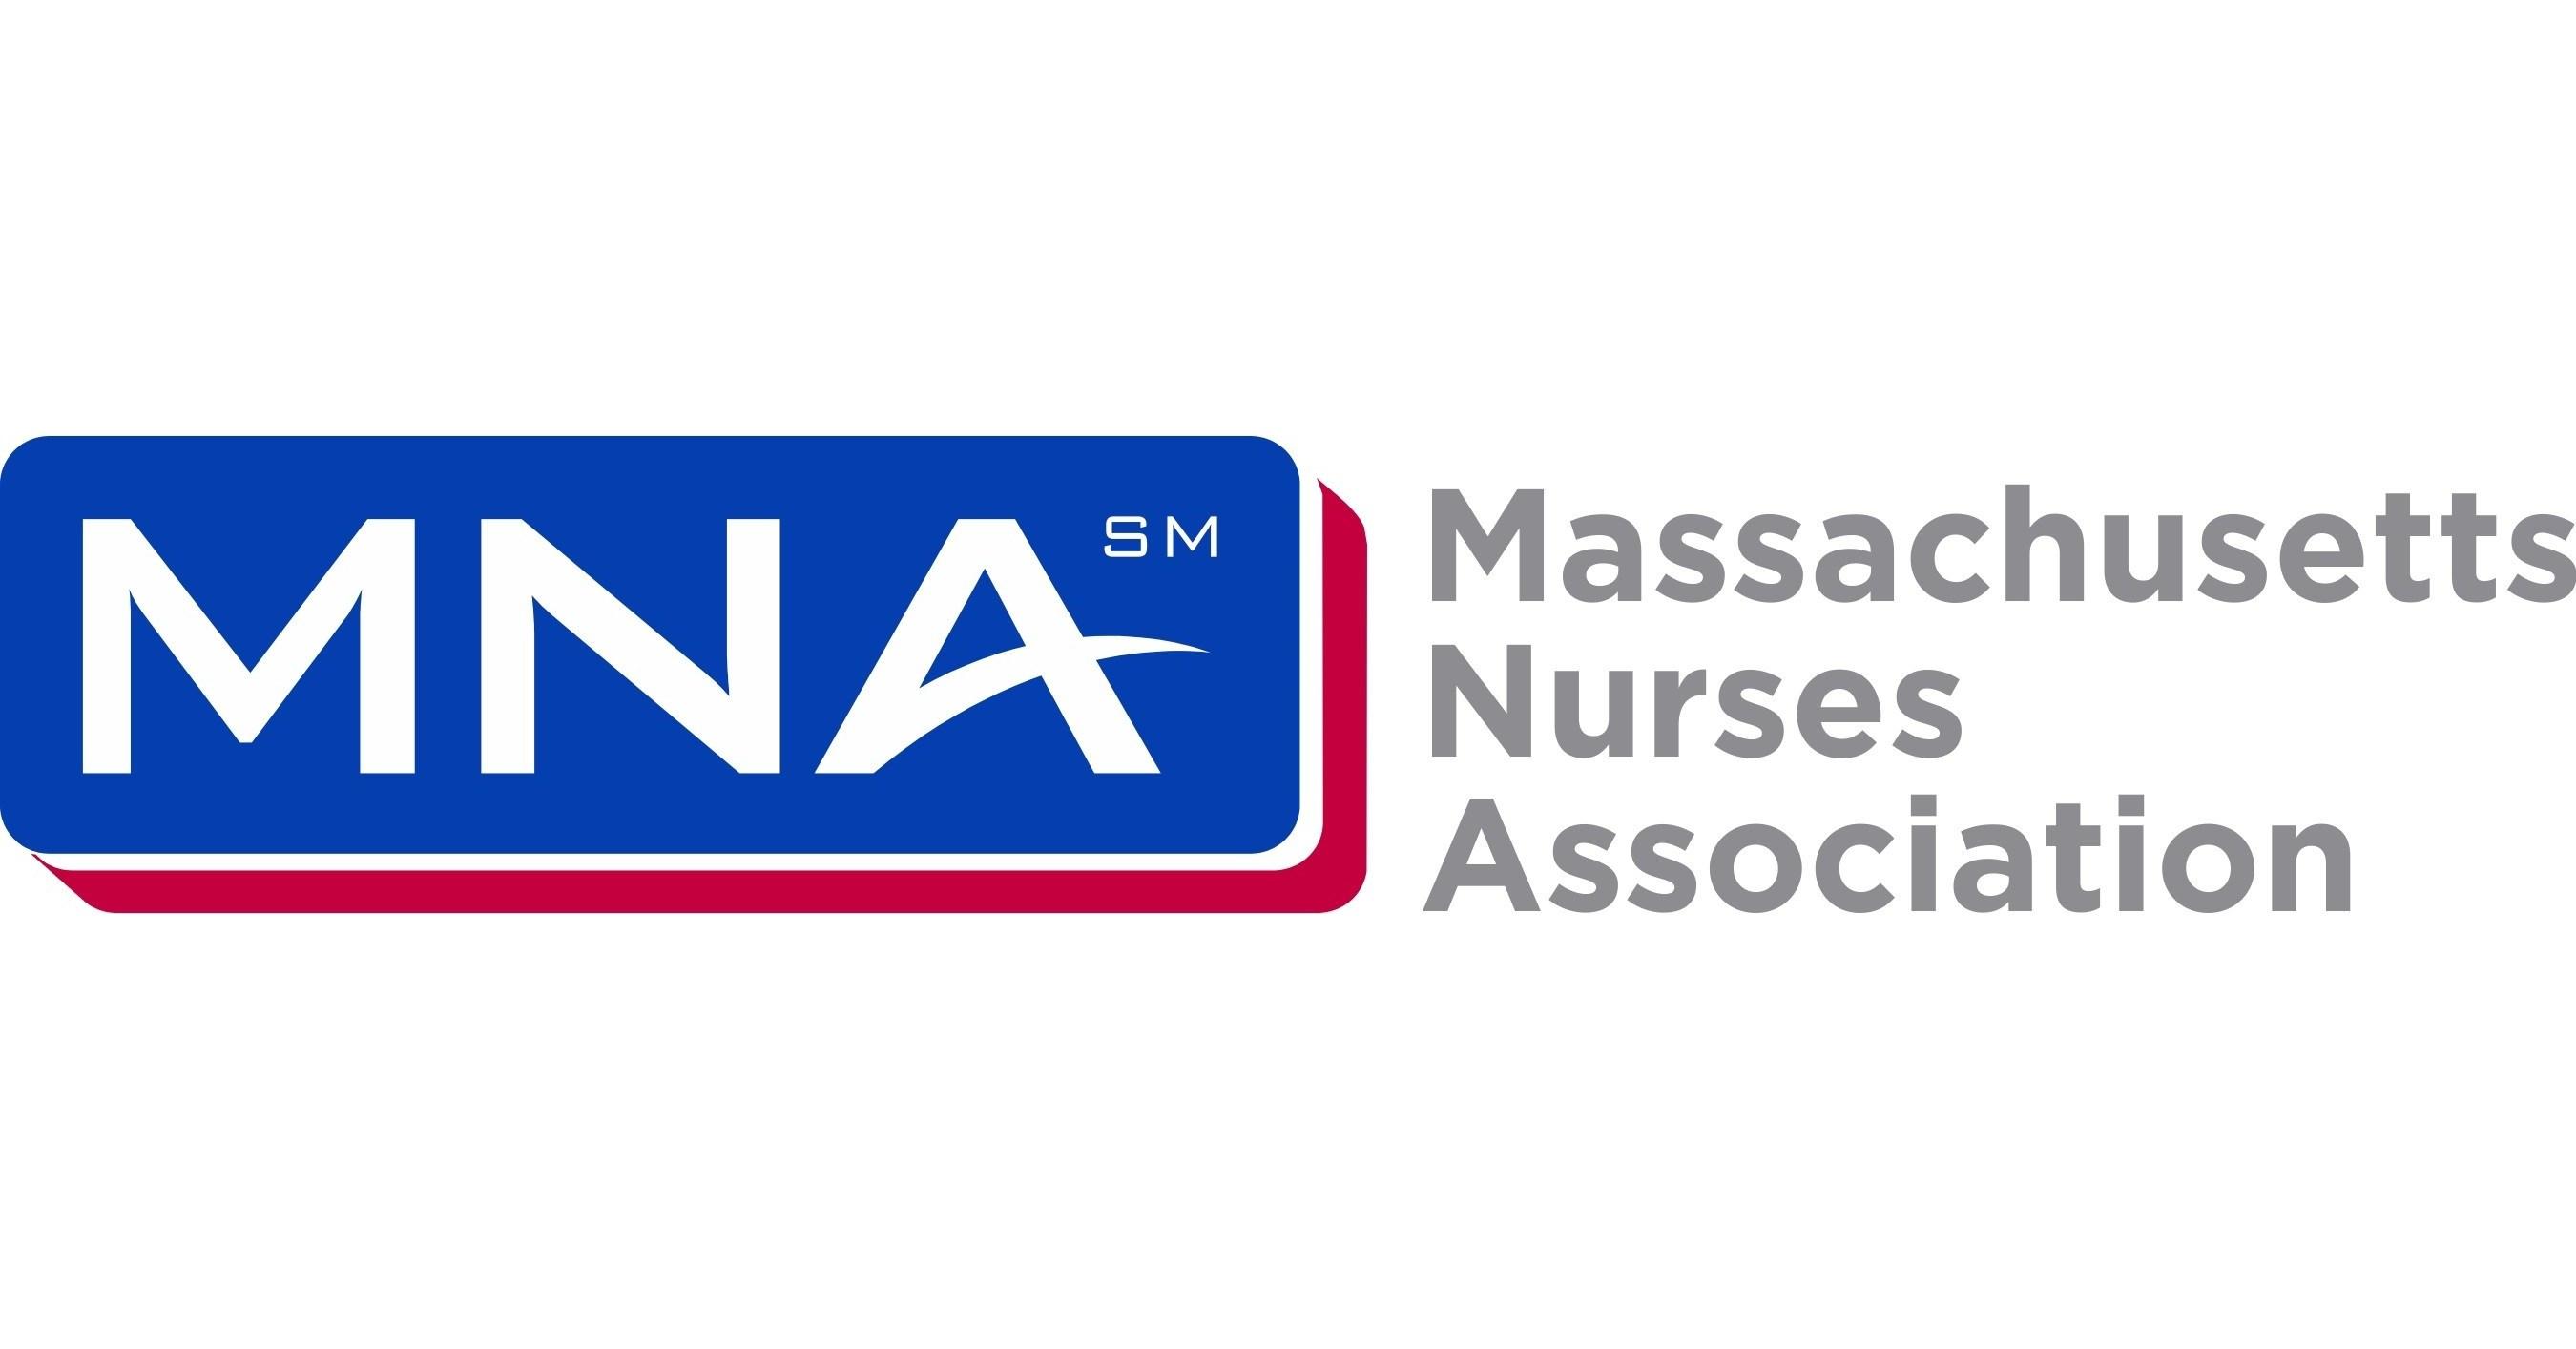 massachusetts nurse association logo jpg?p=facebook.